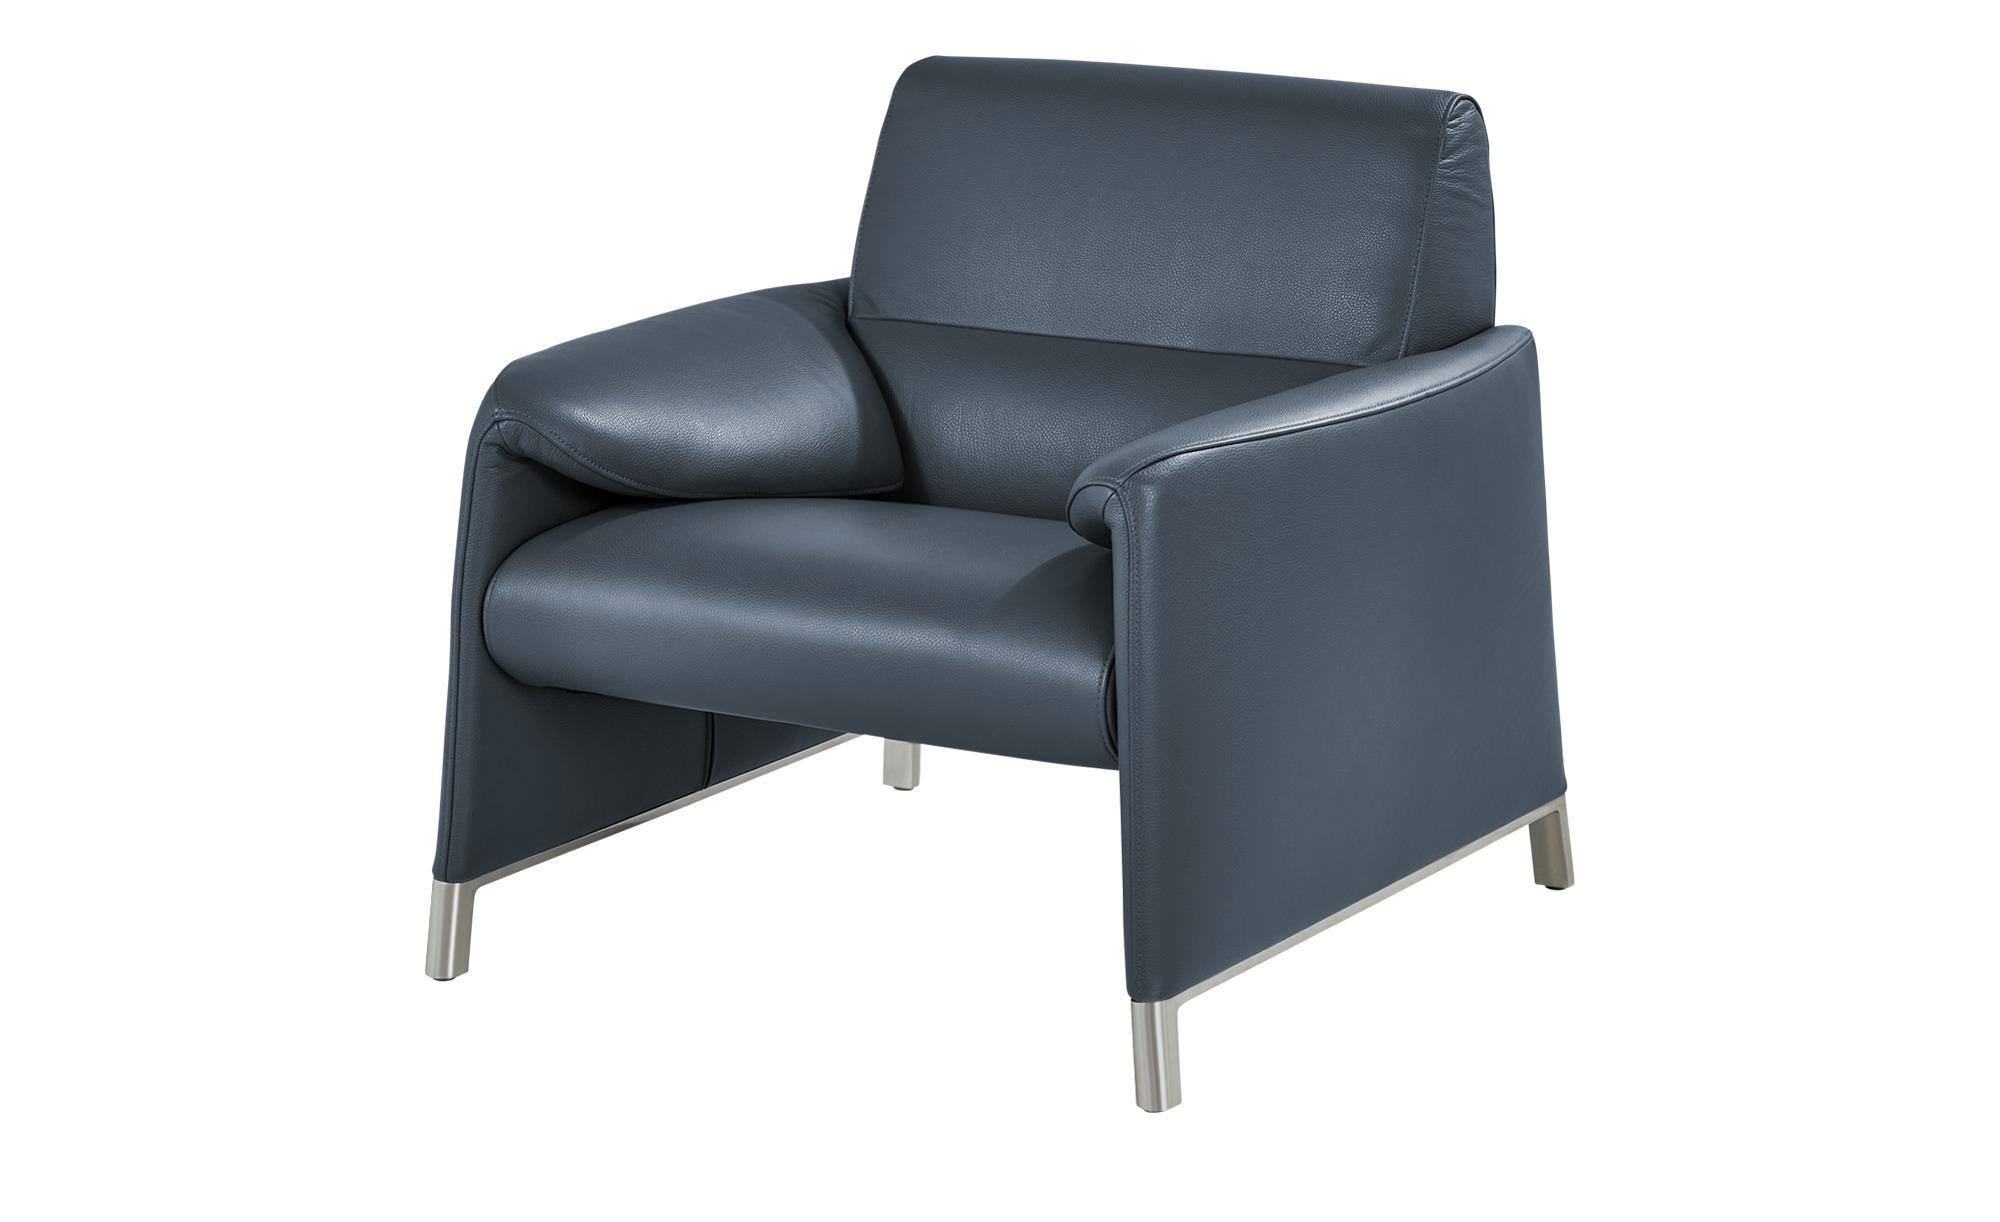 Ledersessel  Felizia ¦ blau ¦ Maße (cm): B: 90 H: 84 T: 88 Polstermöbel > Sessel > Ledersessel - Höffner